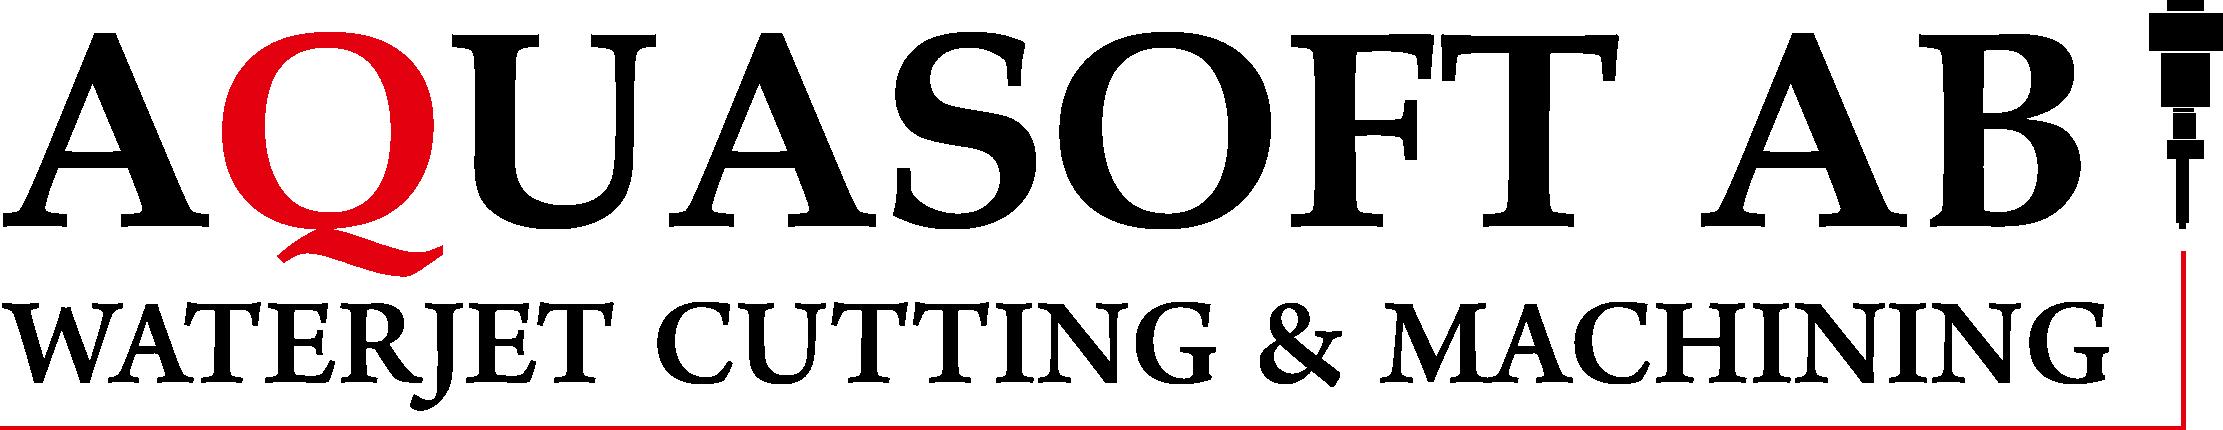 Logotyp av Aquasoft